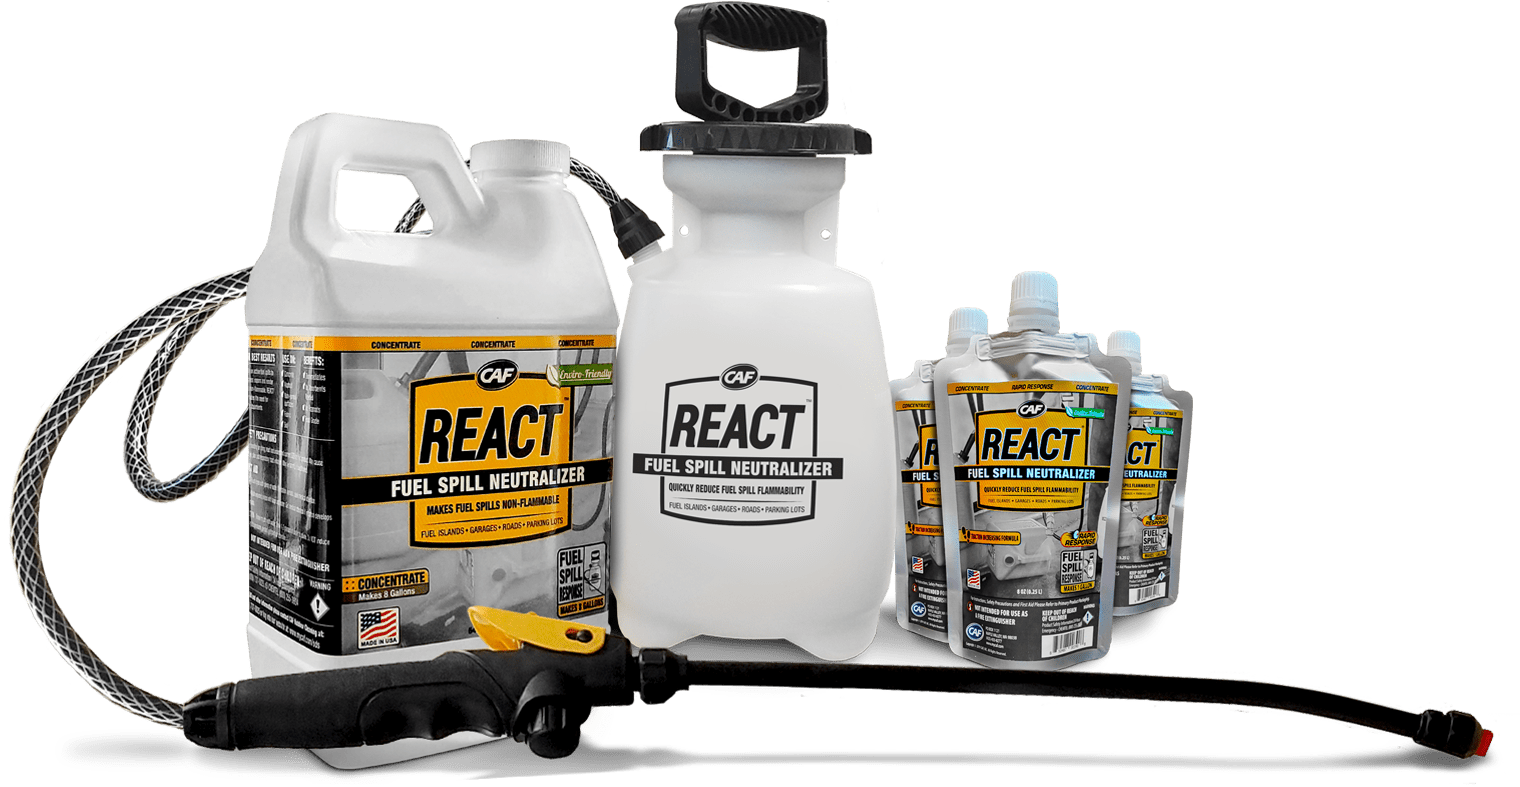 react sprayer and packaging fuel spill neutralizer